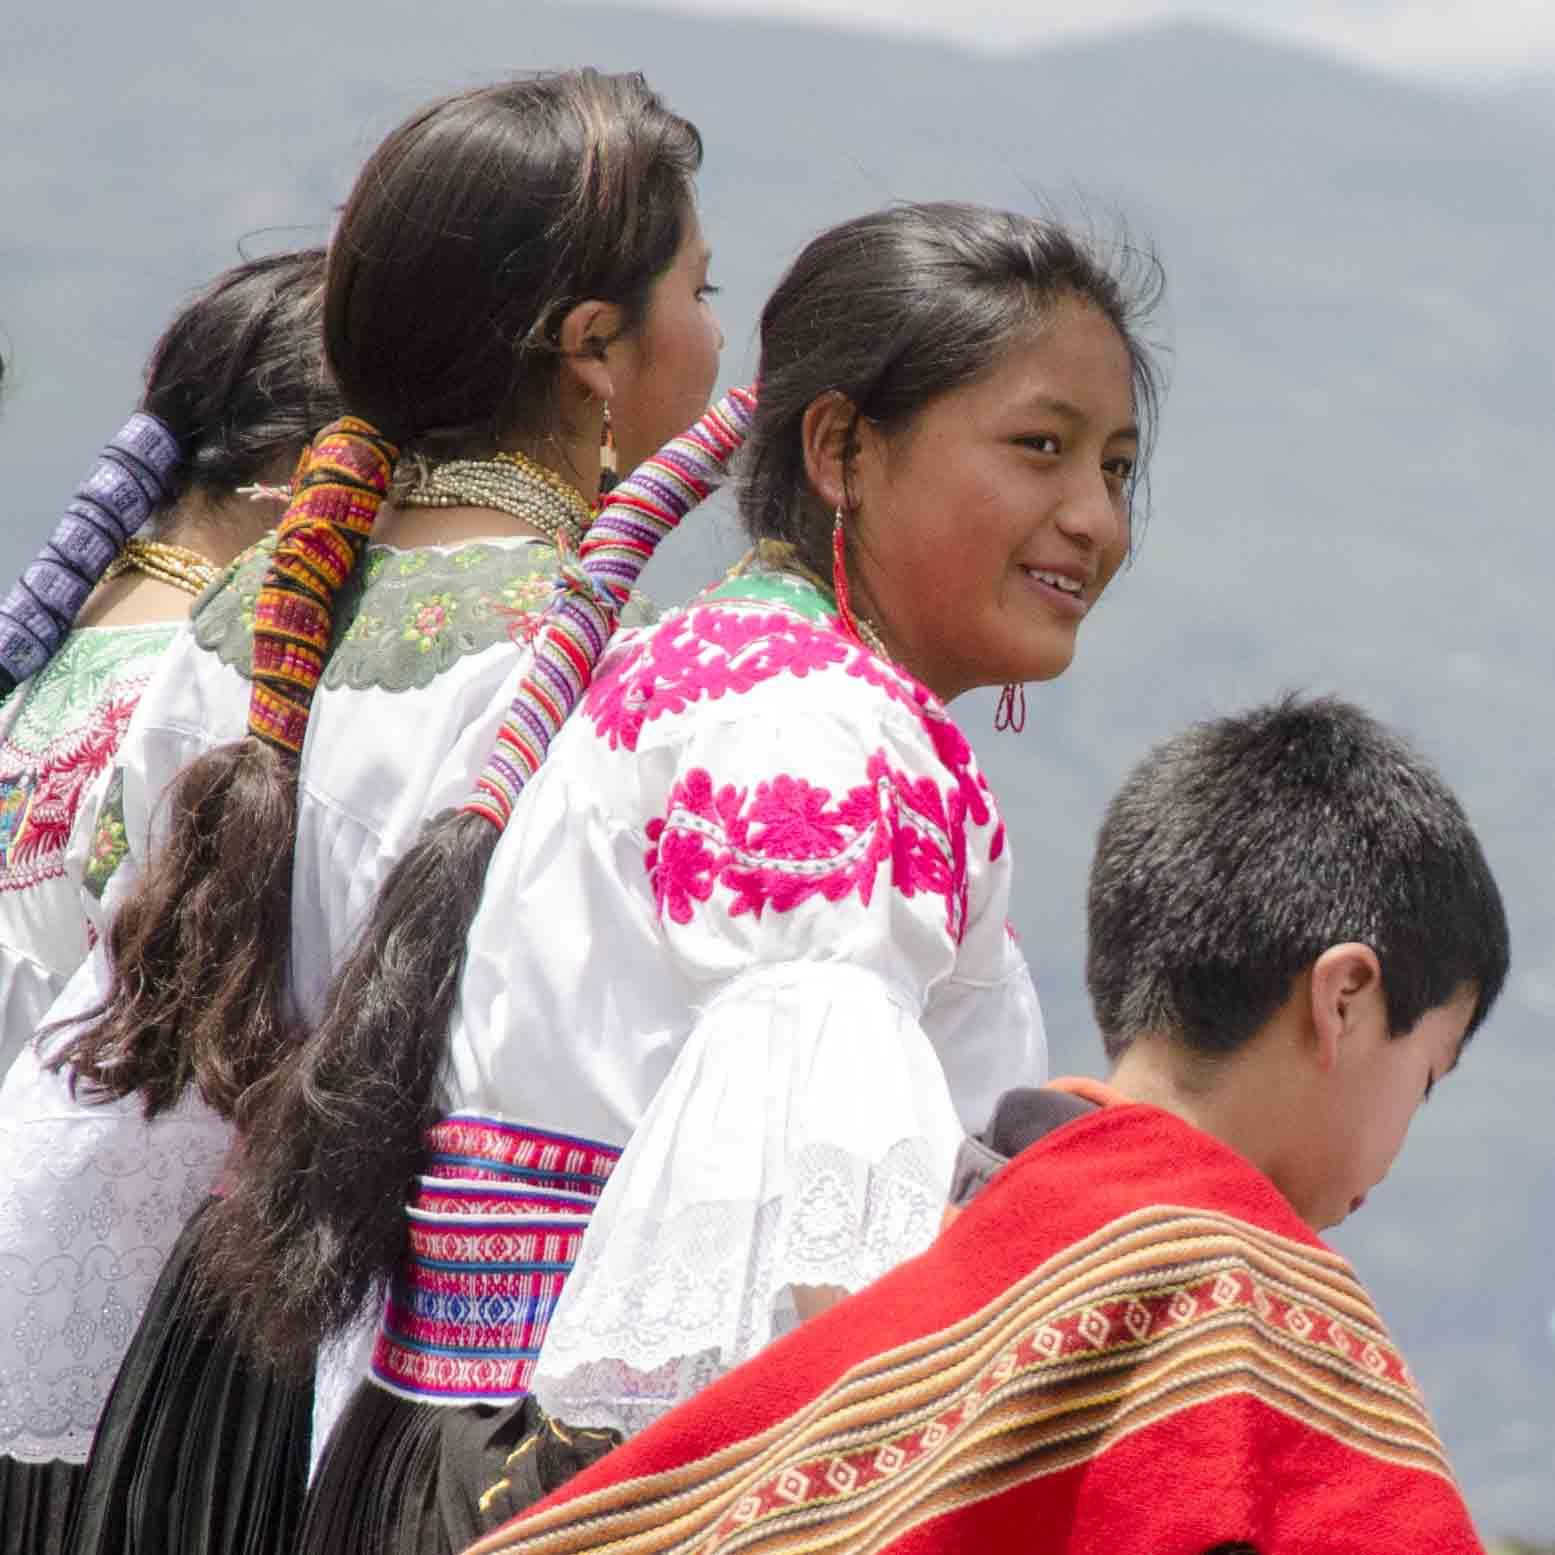 Bailerinas folklóricos, Ecuador | ©Angela Drake